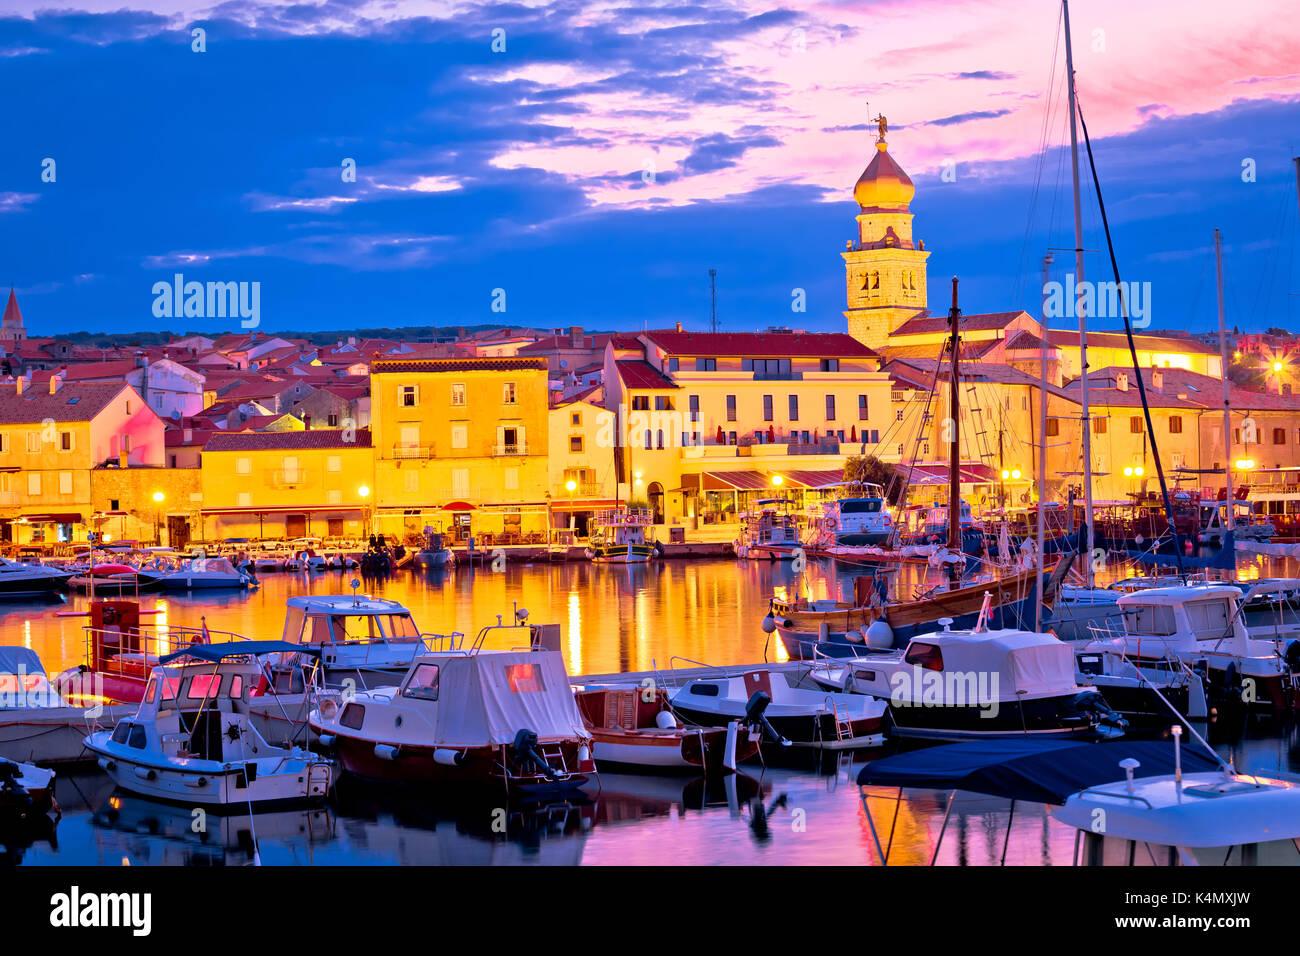 Historic island town of Krk dawn waterfront view, Kvarner bay archipelago of Croatia Stock Photo